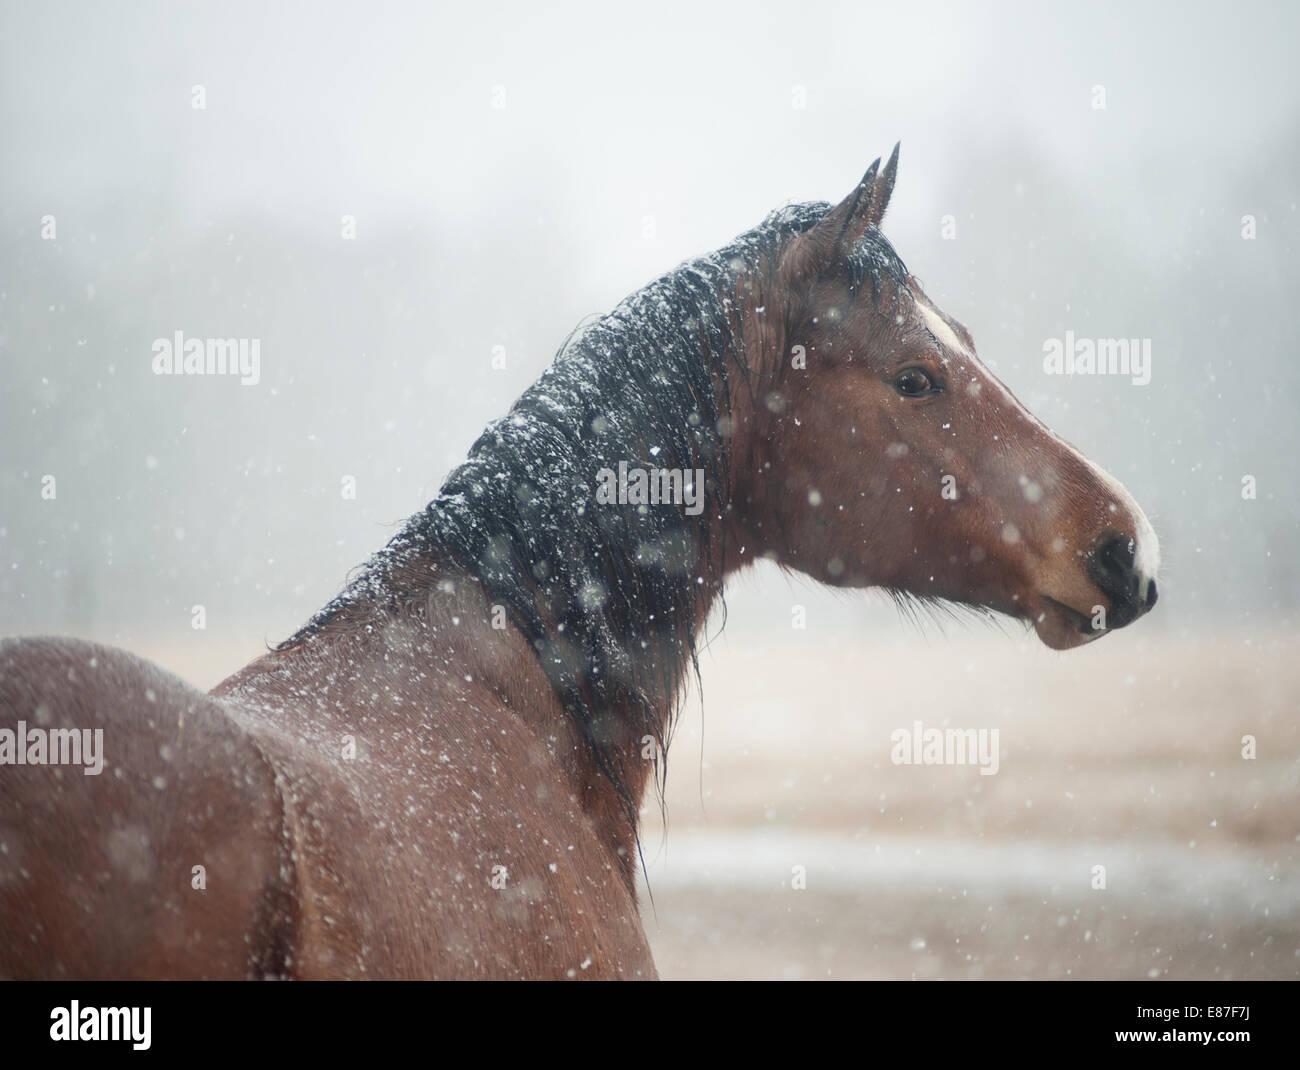 Stute im Schneesturm Stockbild